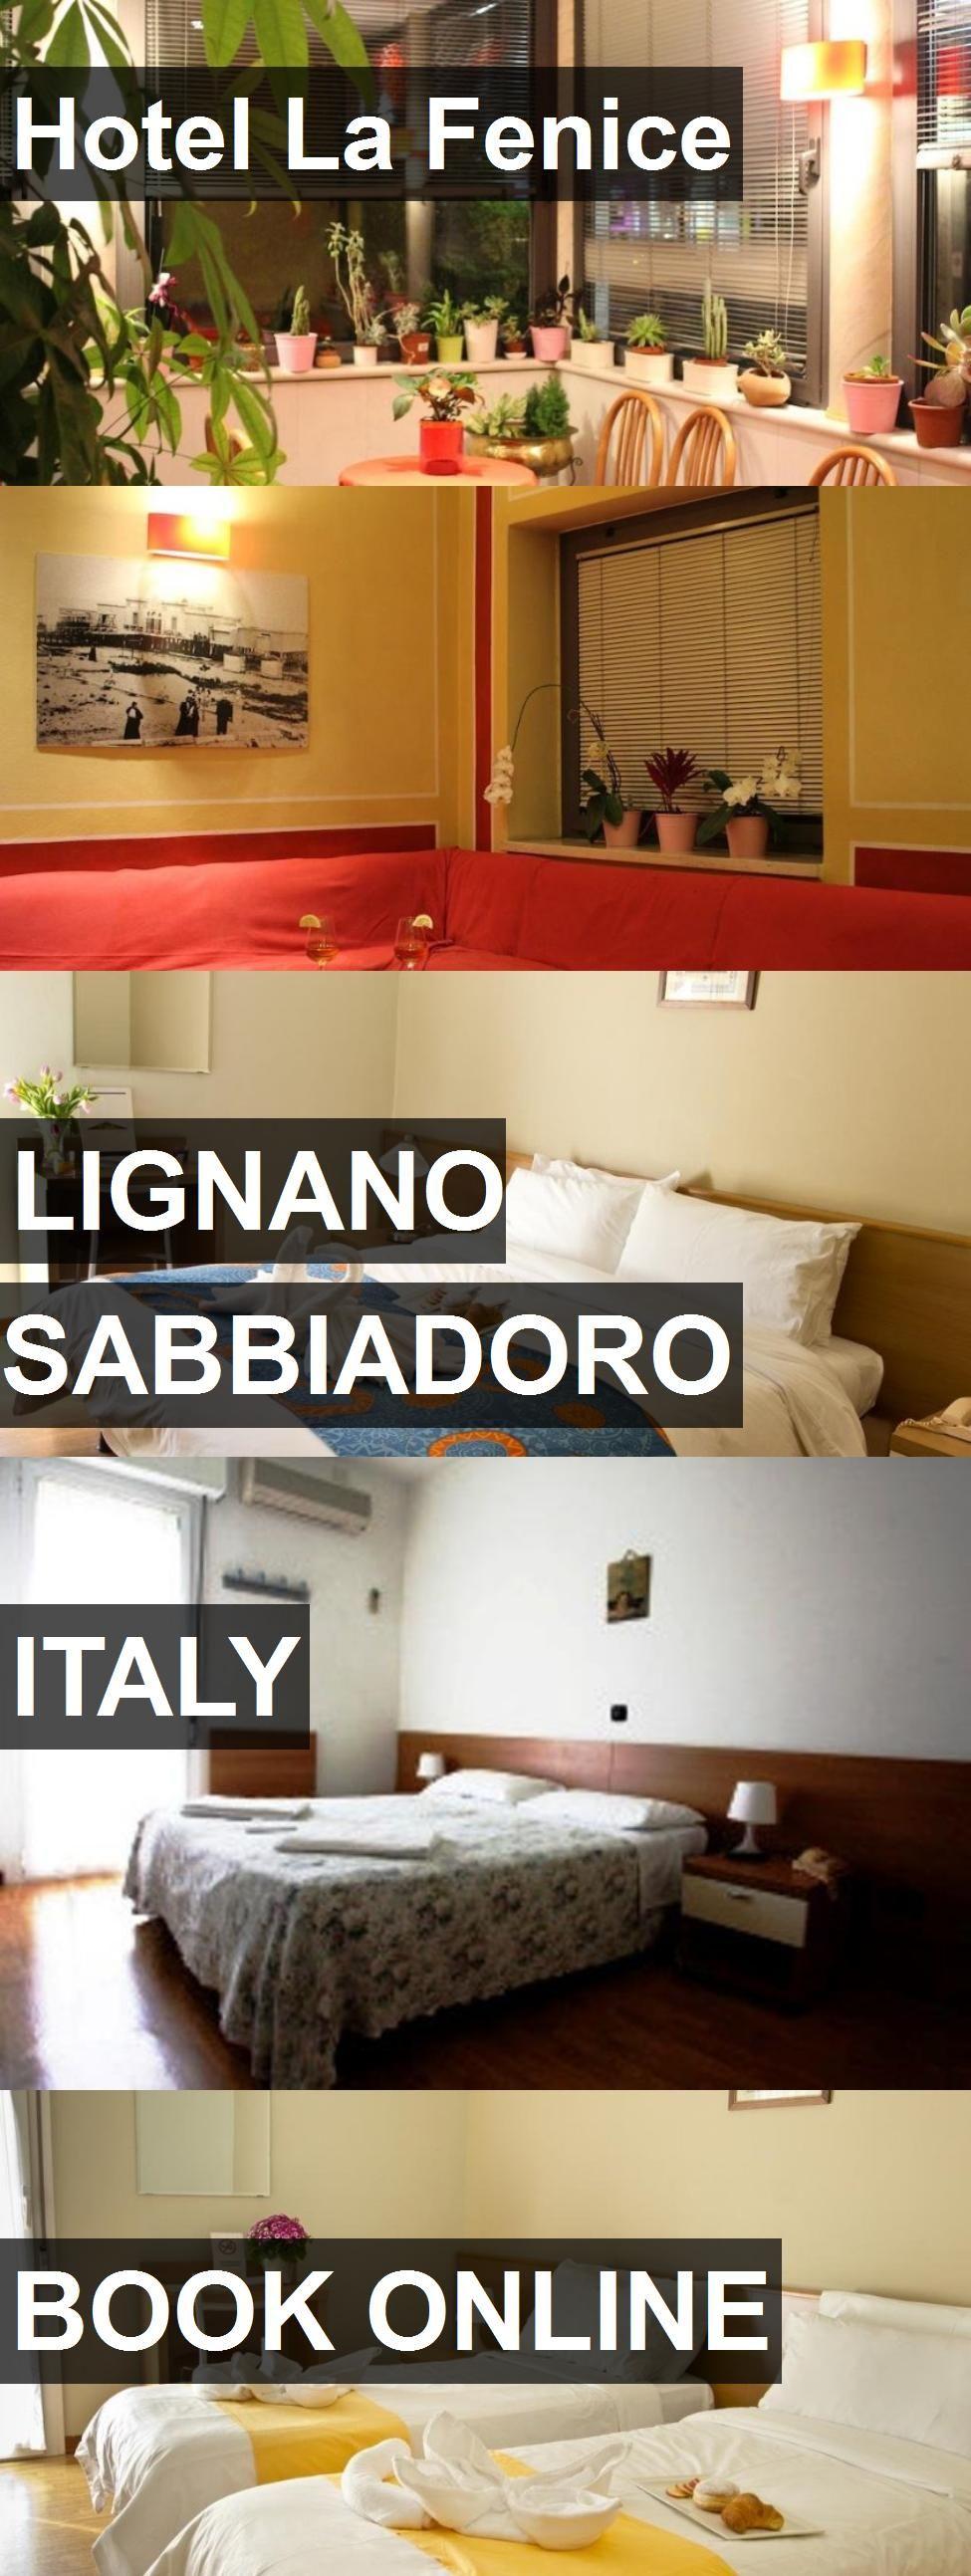 Hotel Hotel La Fenice in Lignano Sabbiadoro, Italy. For